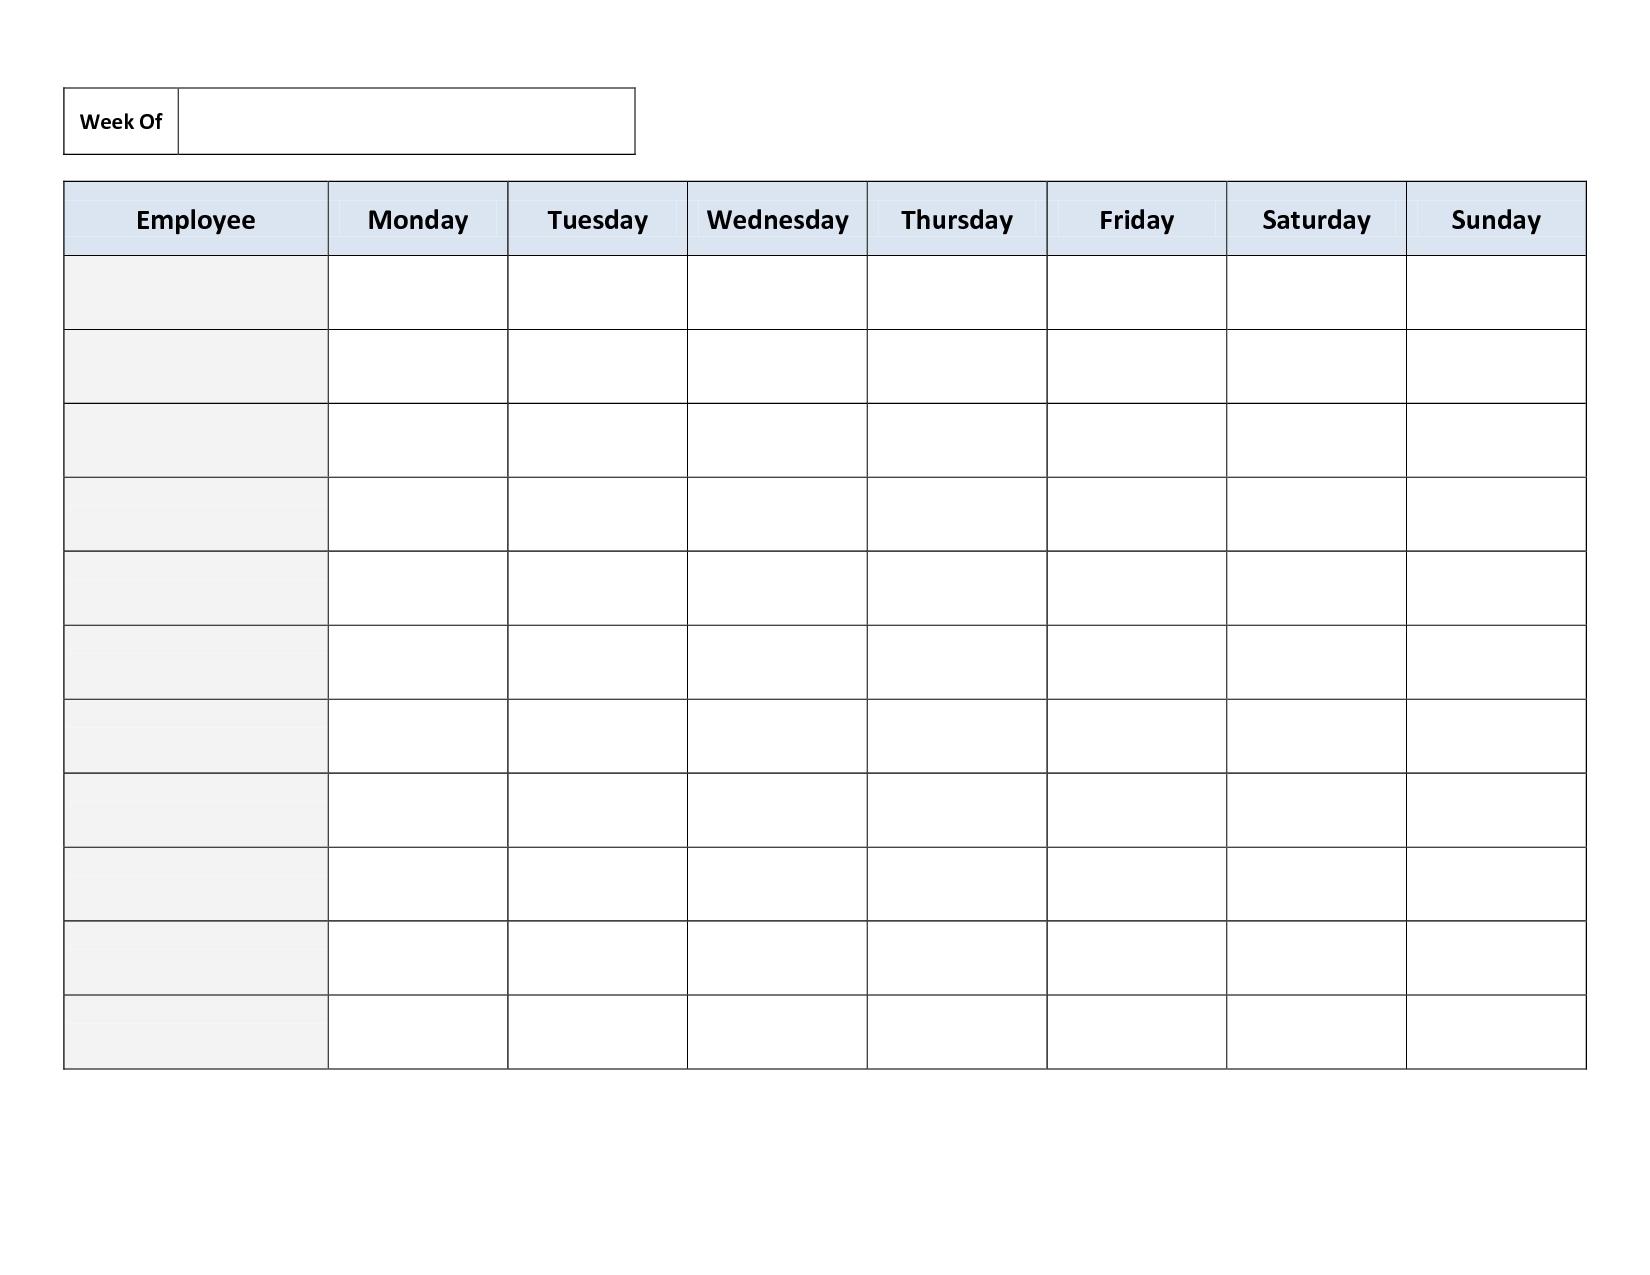 Monday To Sunday Calendar Template Writing Practice Free Printable Monday Sunday Schedule